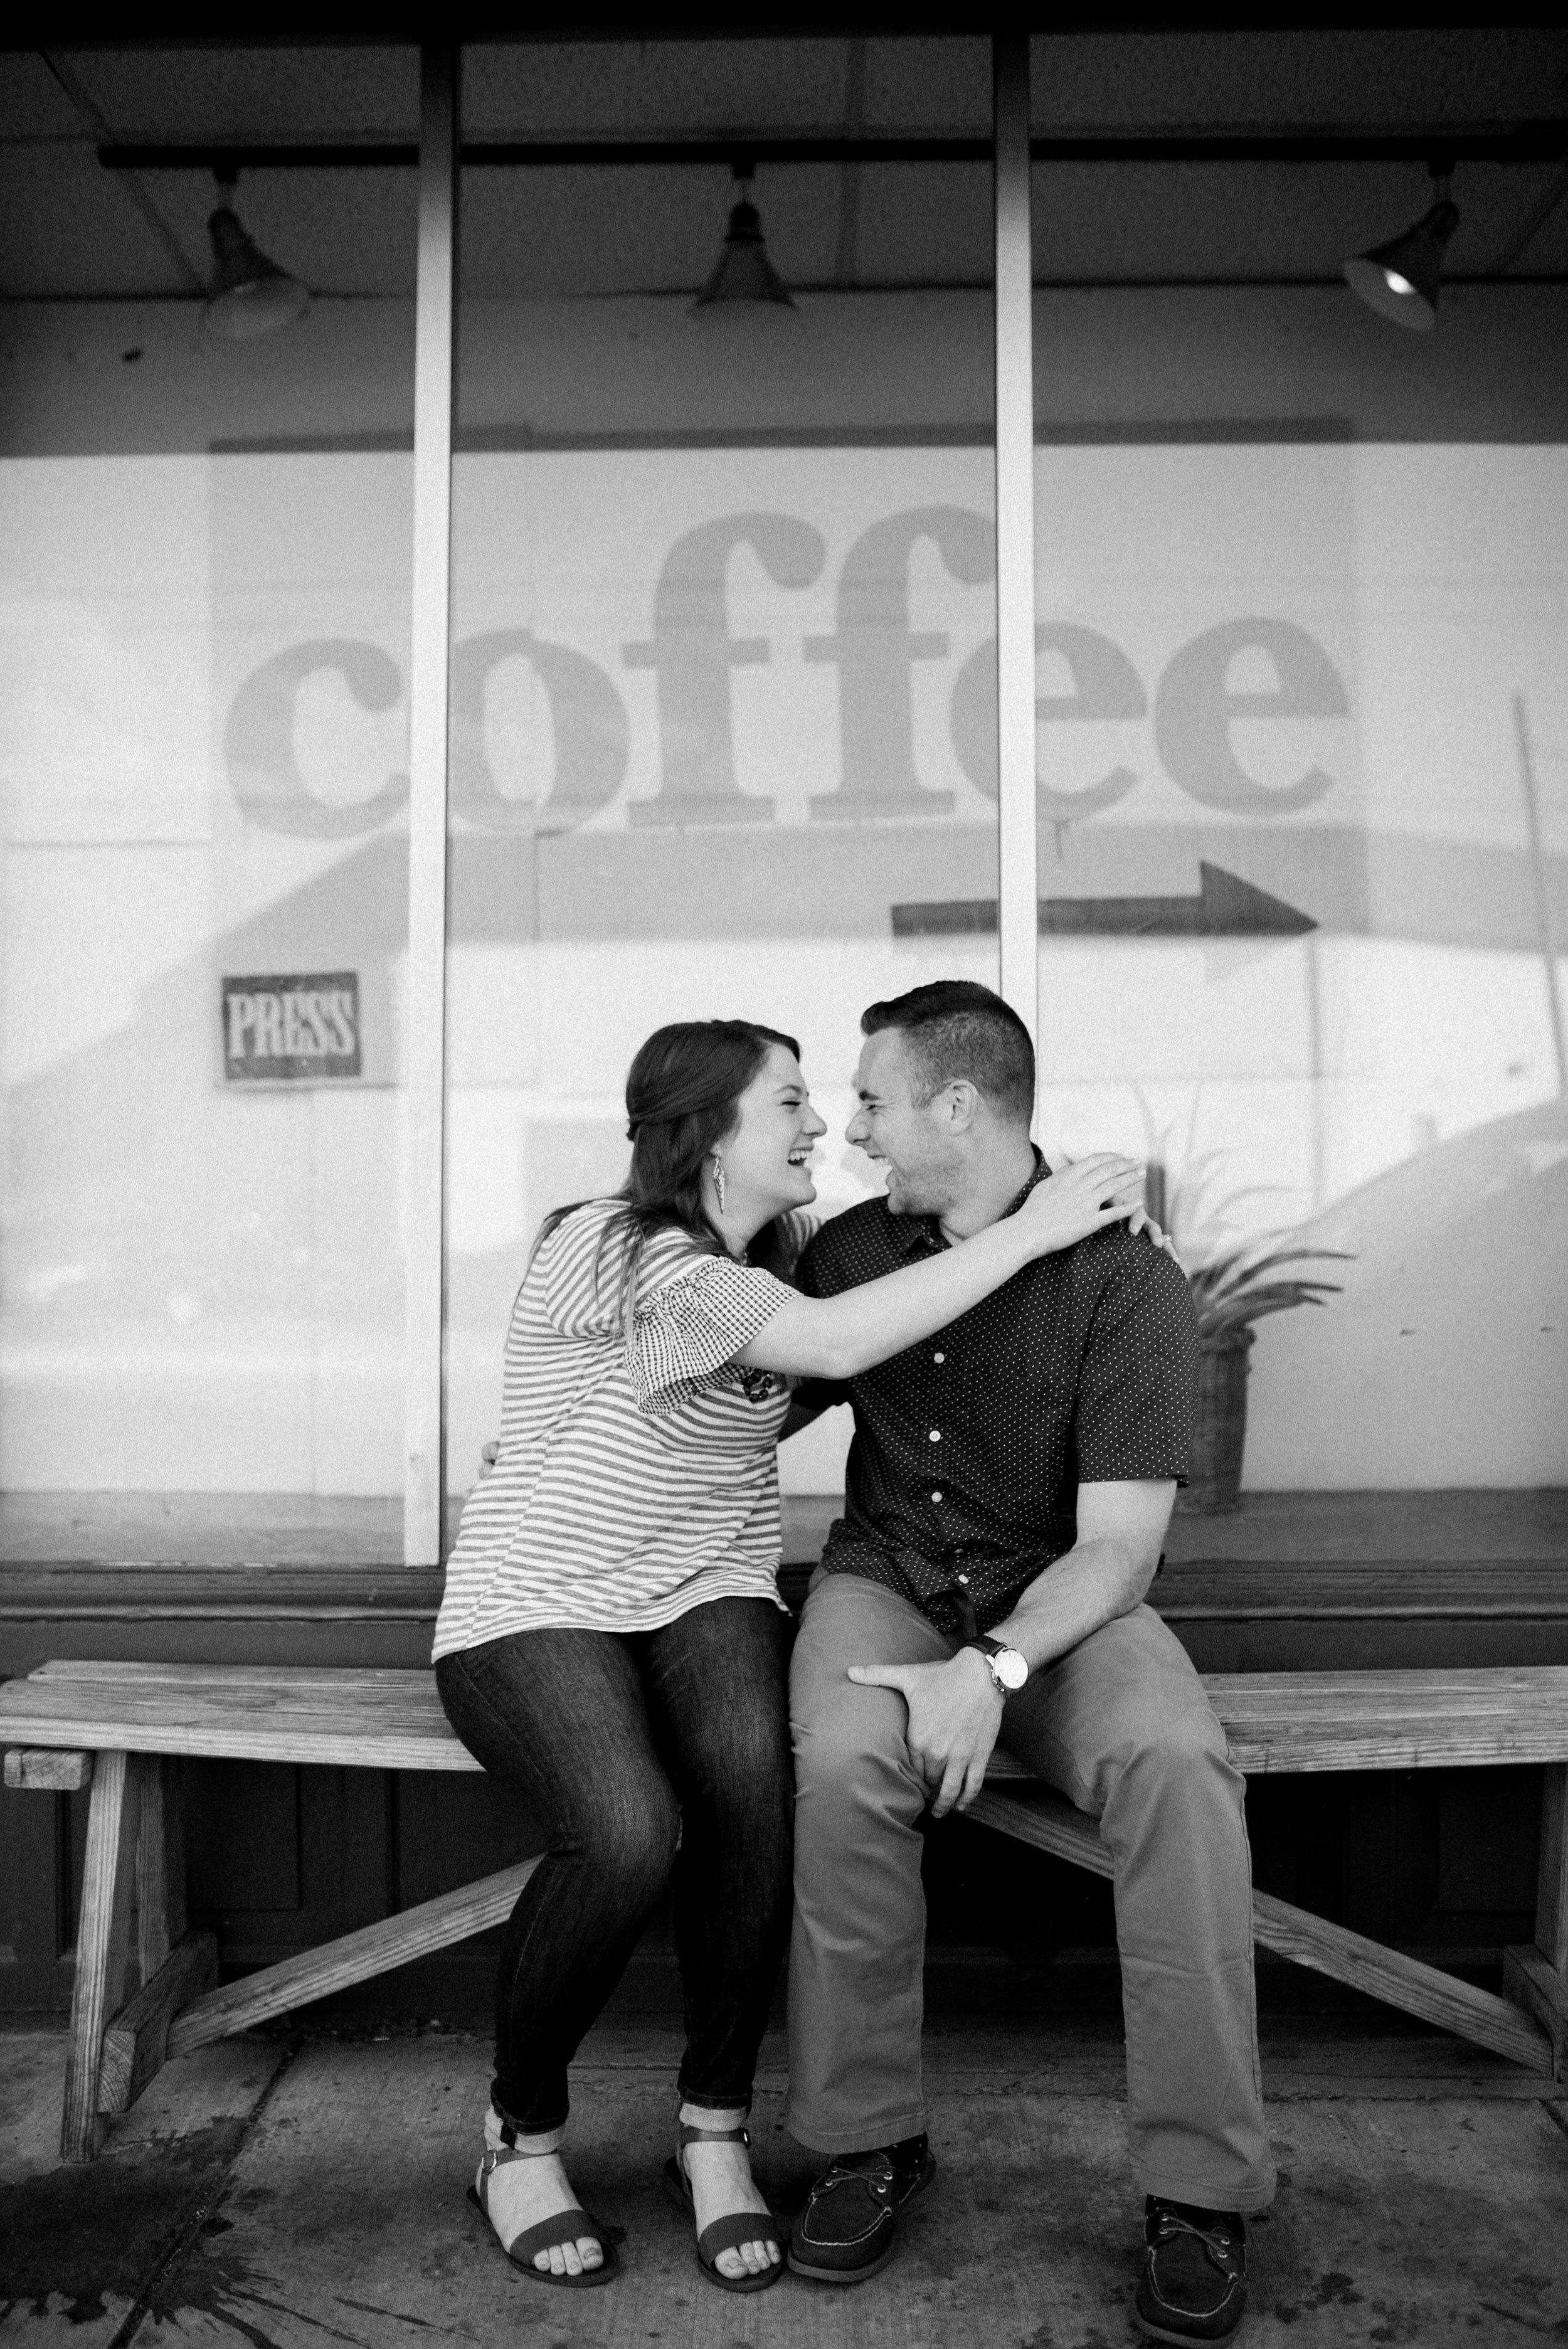 michele&keith-Chelsea-Hall-Photography-Dayton-OH-7.jpg